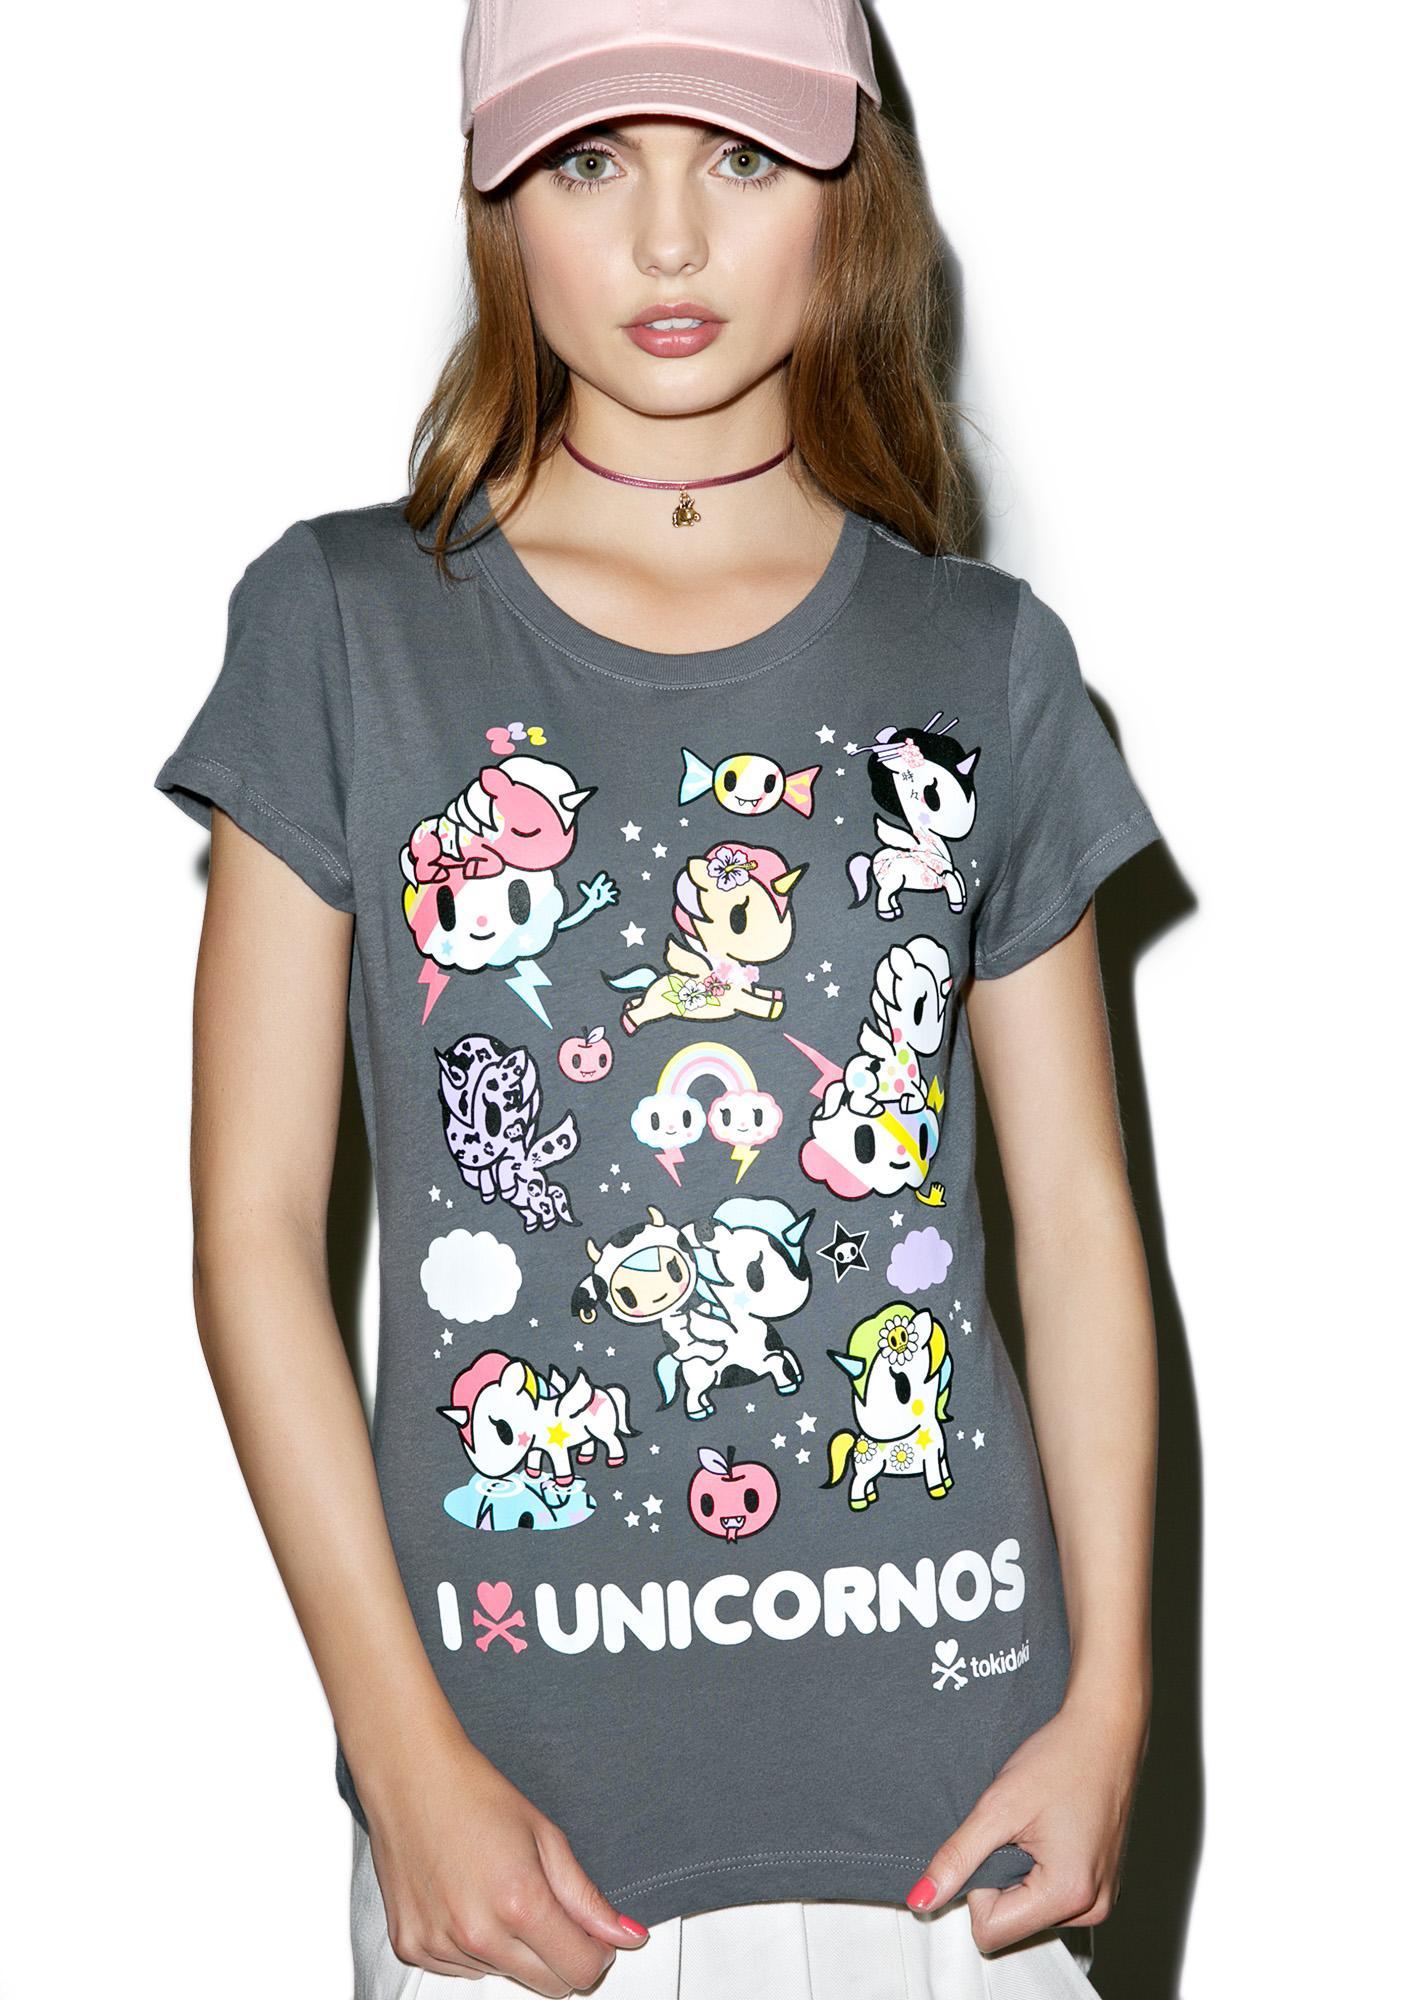 Tokidoki I Heart Unicornos Tee